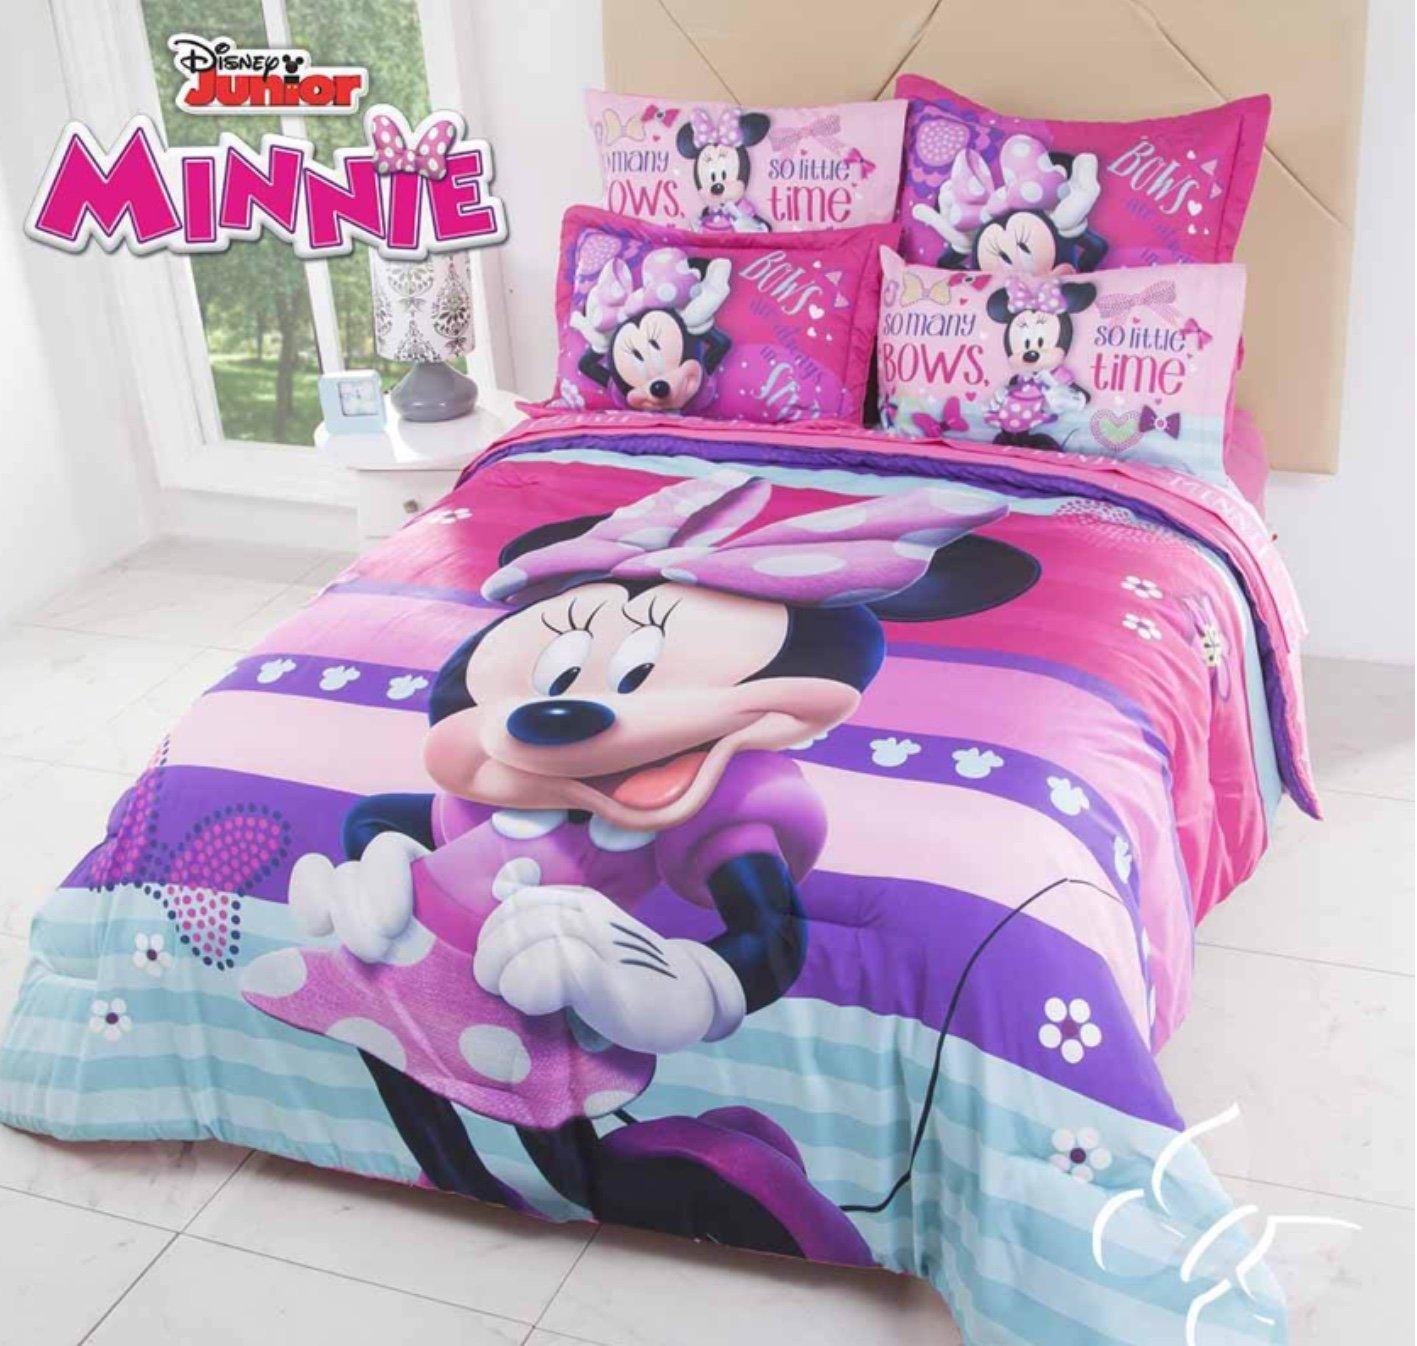 Disney Minnie Moda布団セット3個フルサイズ B0773K63SM